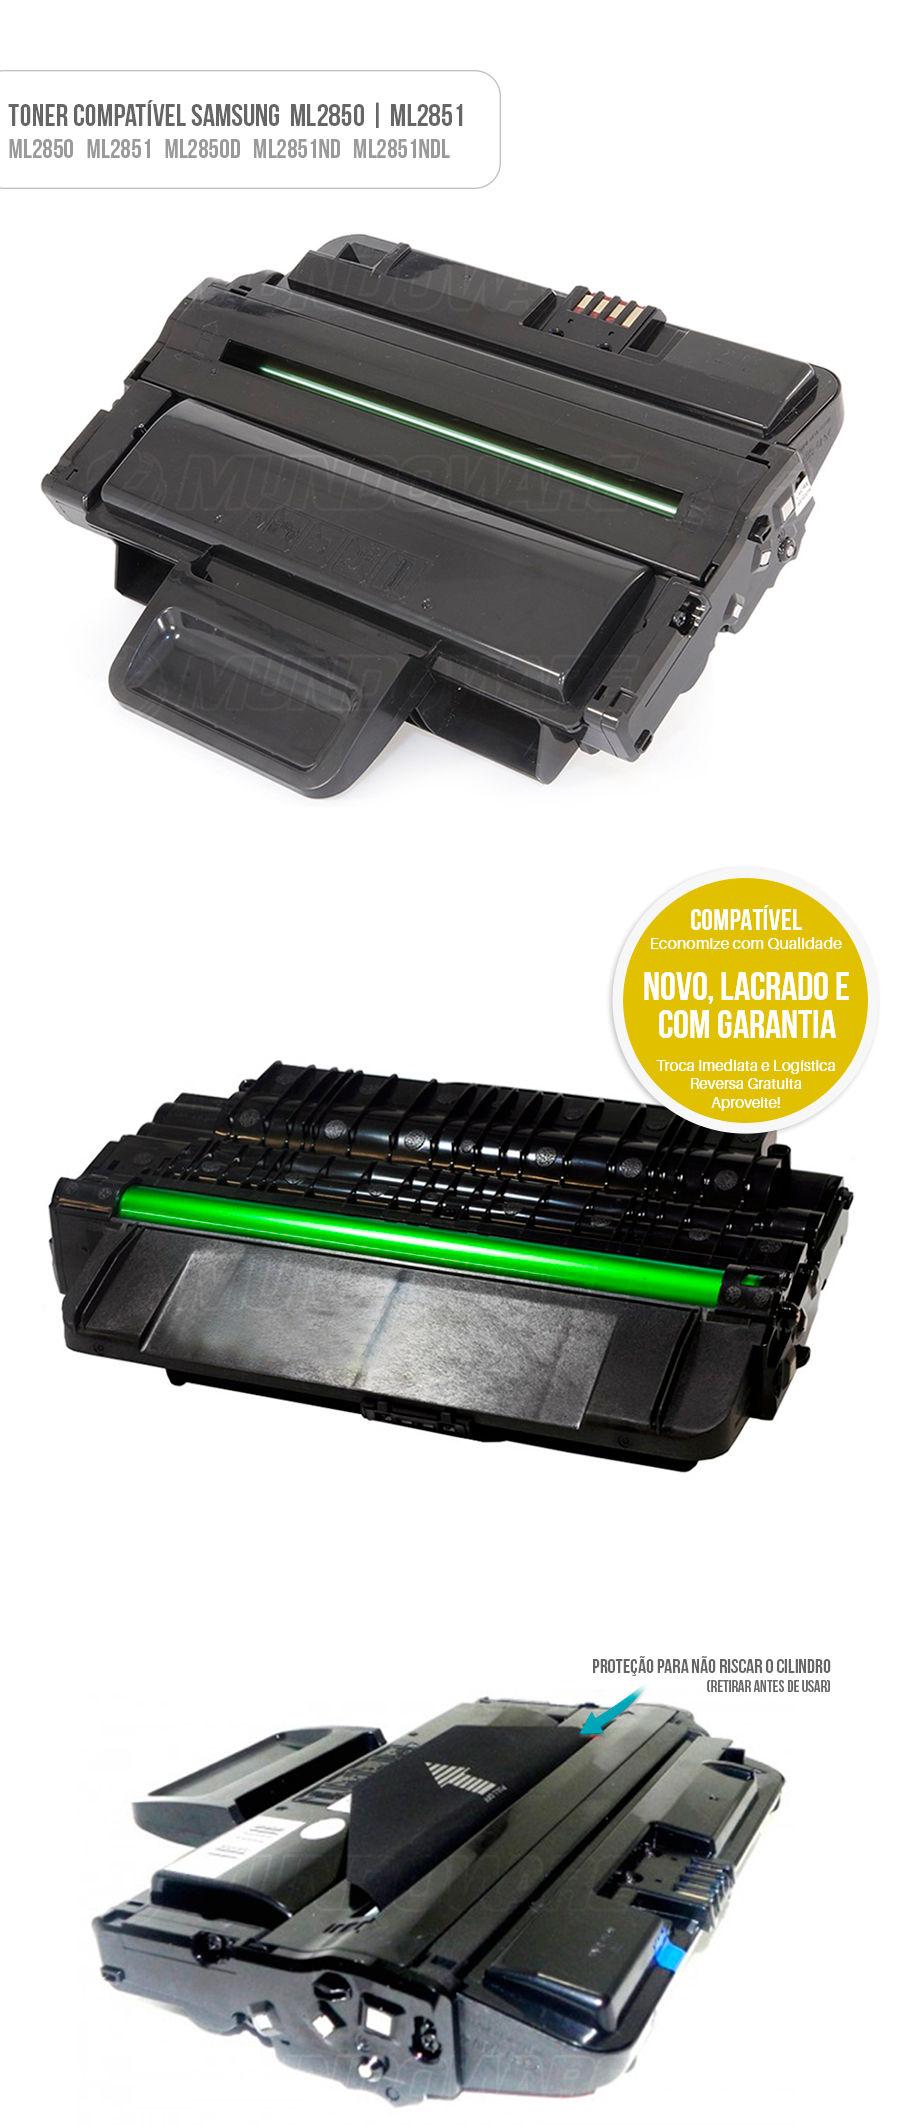 Samsung Toner ML2850 ML2851 2850 2050 2851 Tonner